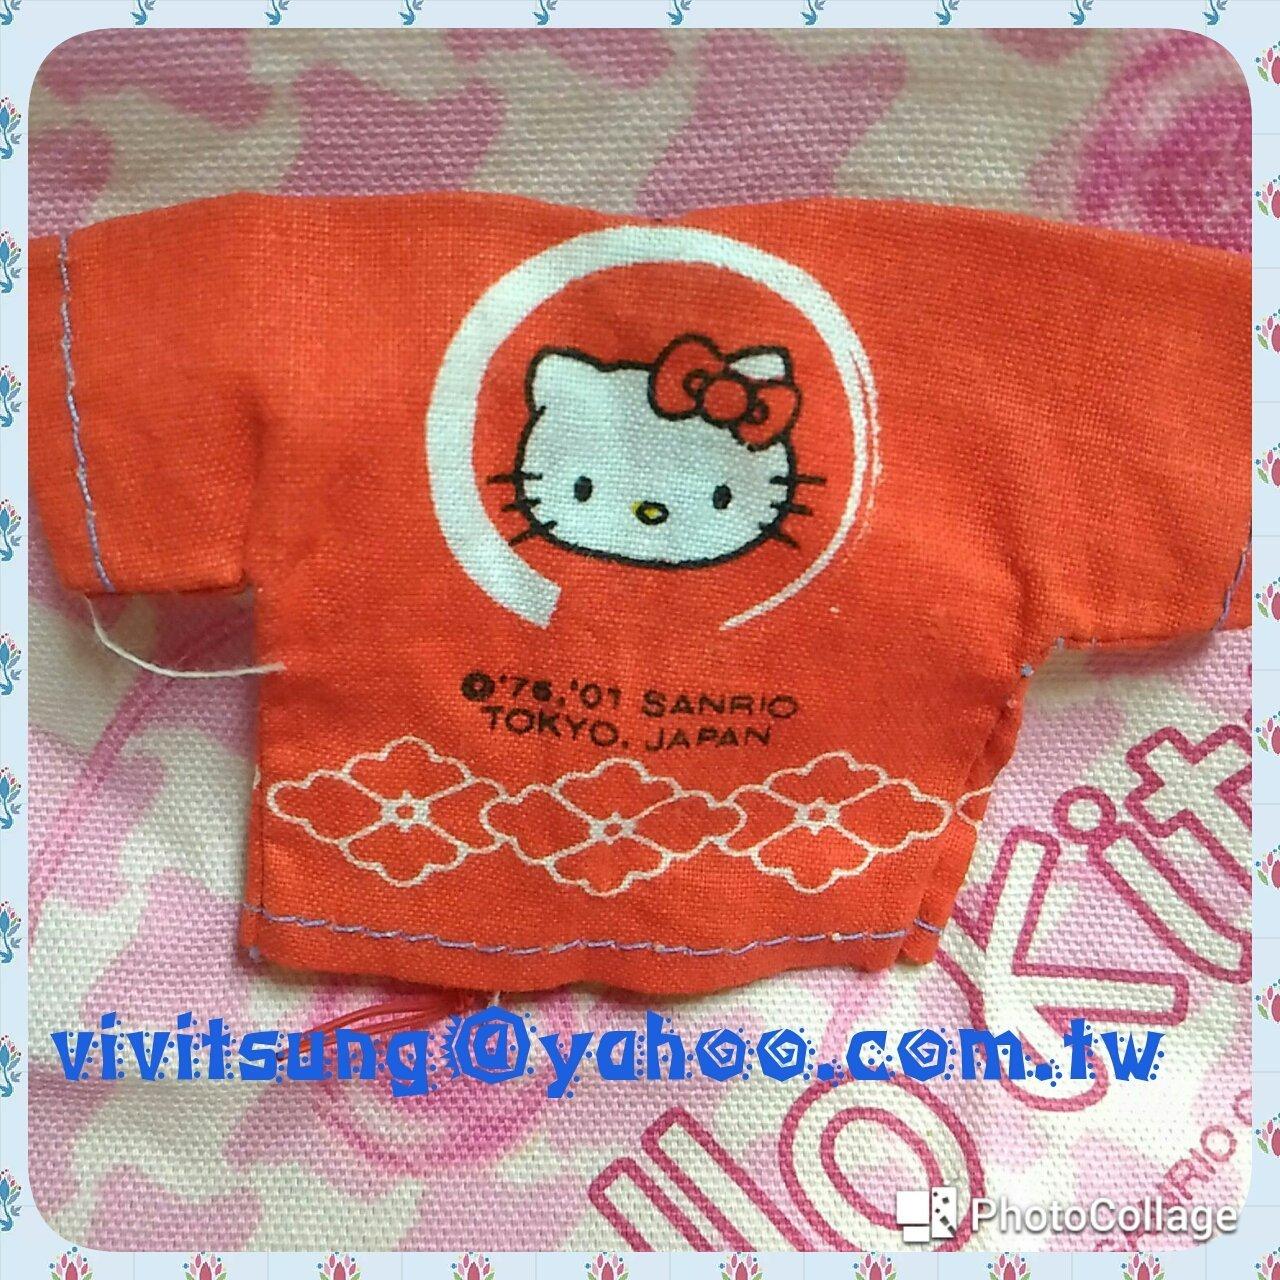 sanrio2001年 珍藏品**Hello Kitty迷你和風衣* ㊣